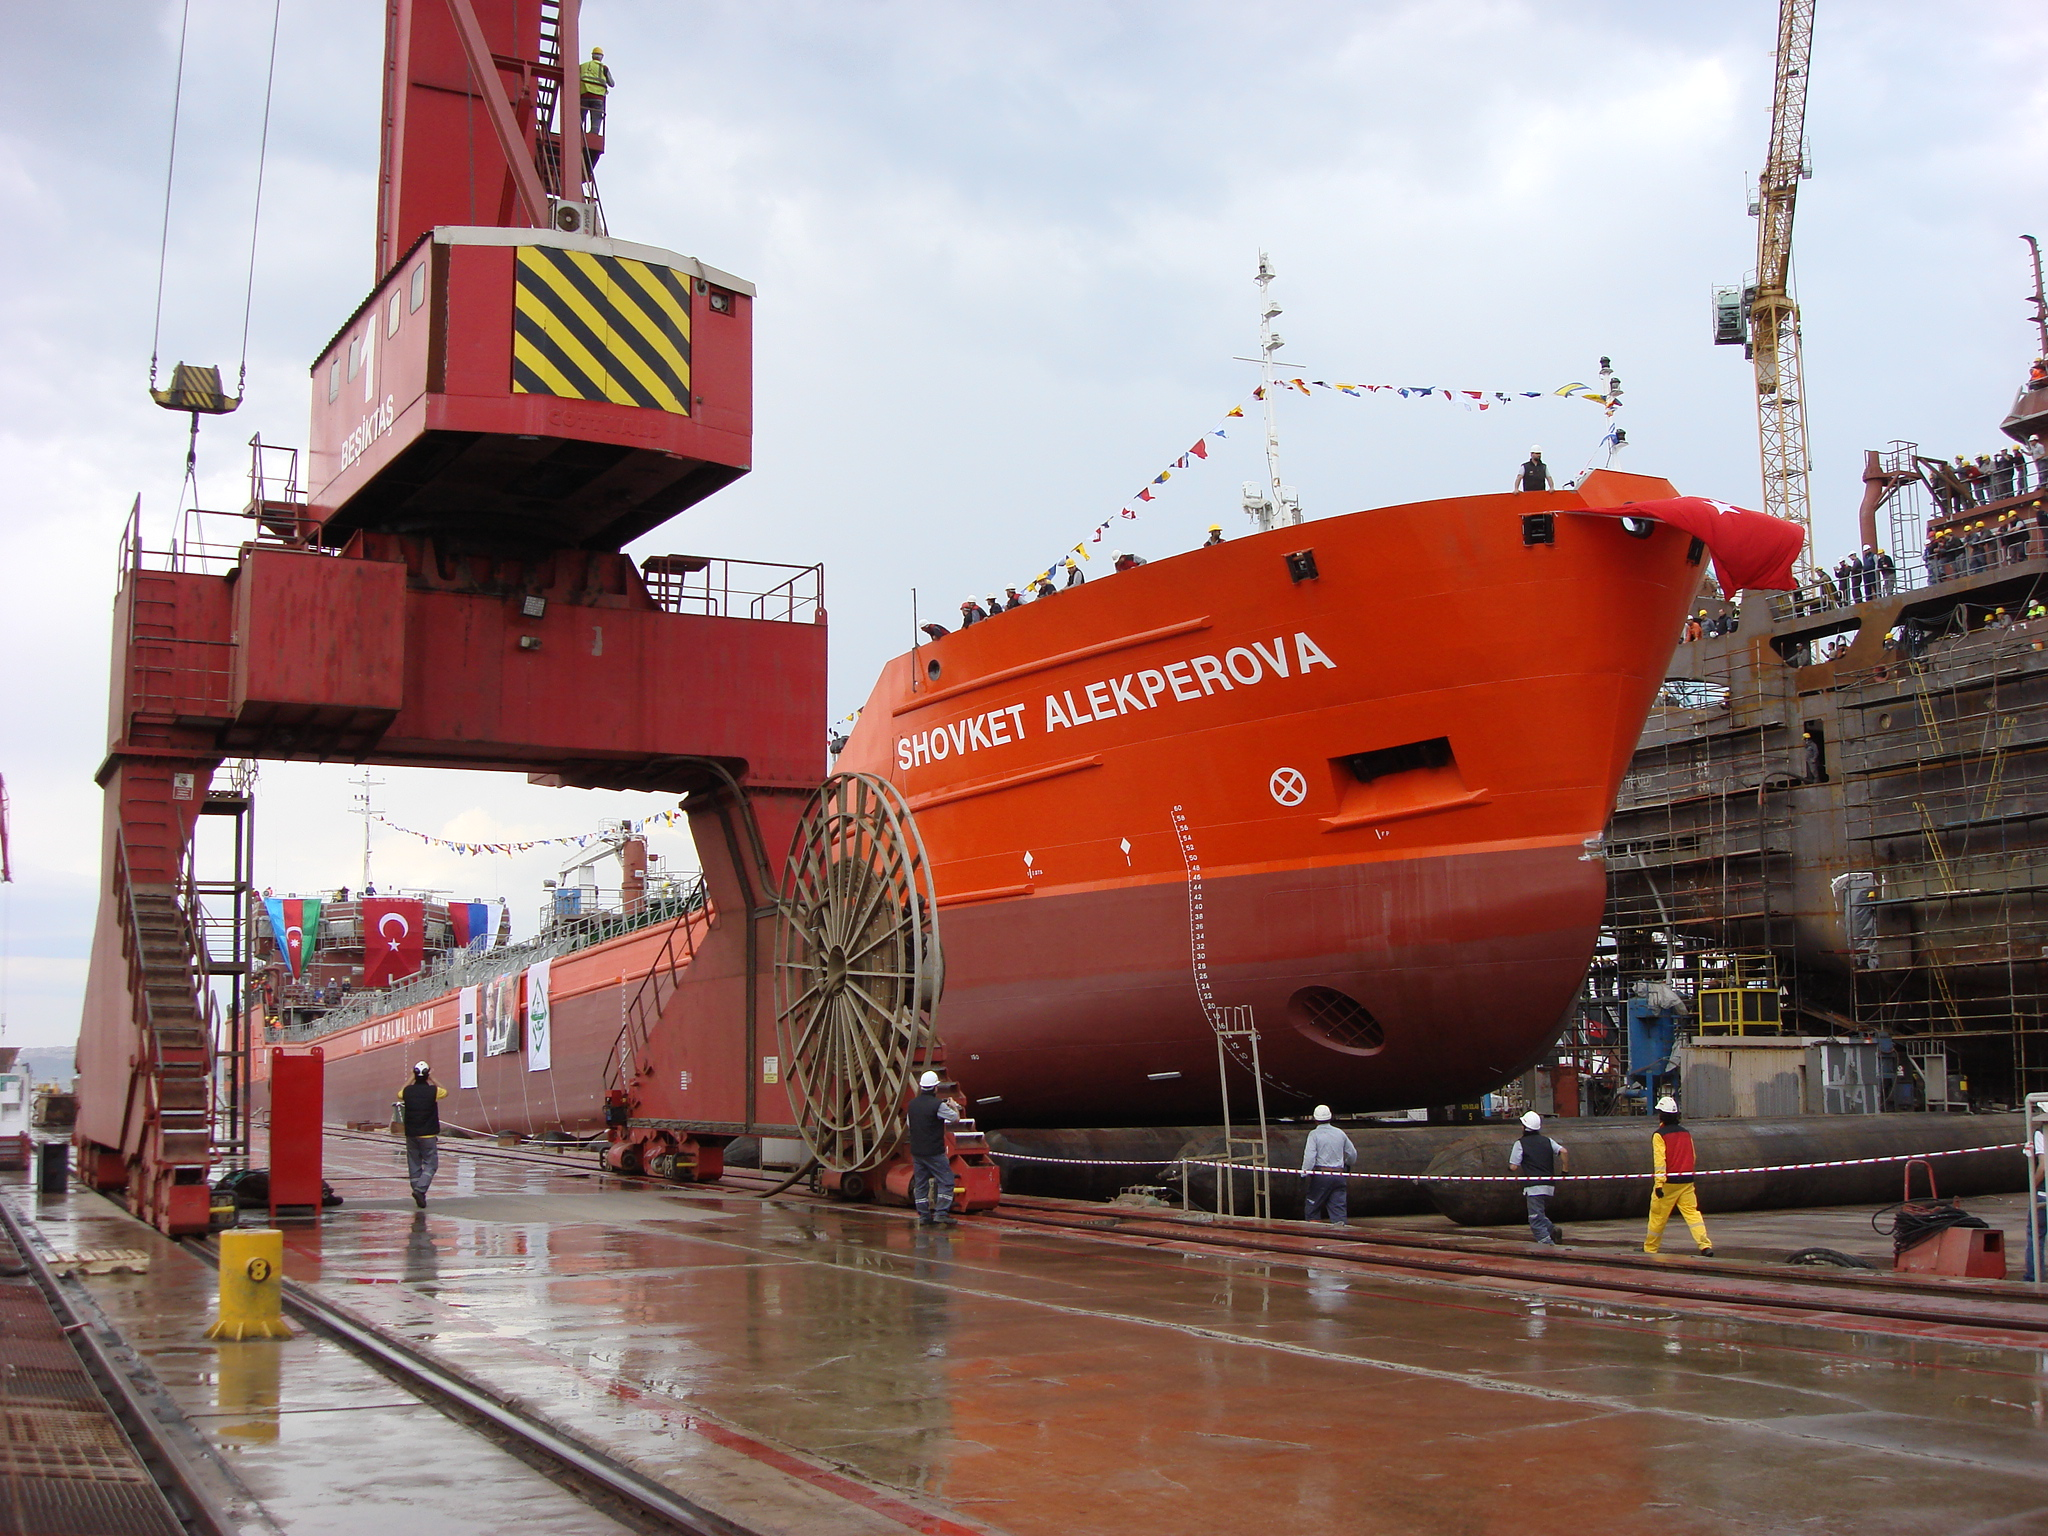 Спущен на воду танкер «Шовкет Алекперова» - ФОТО